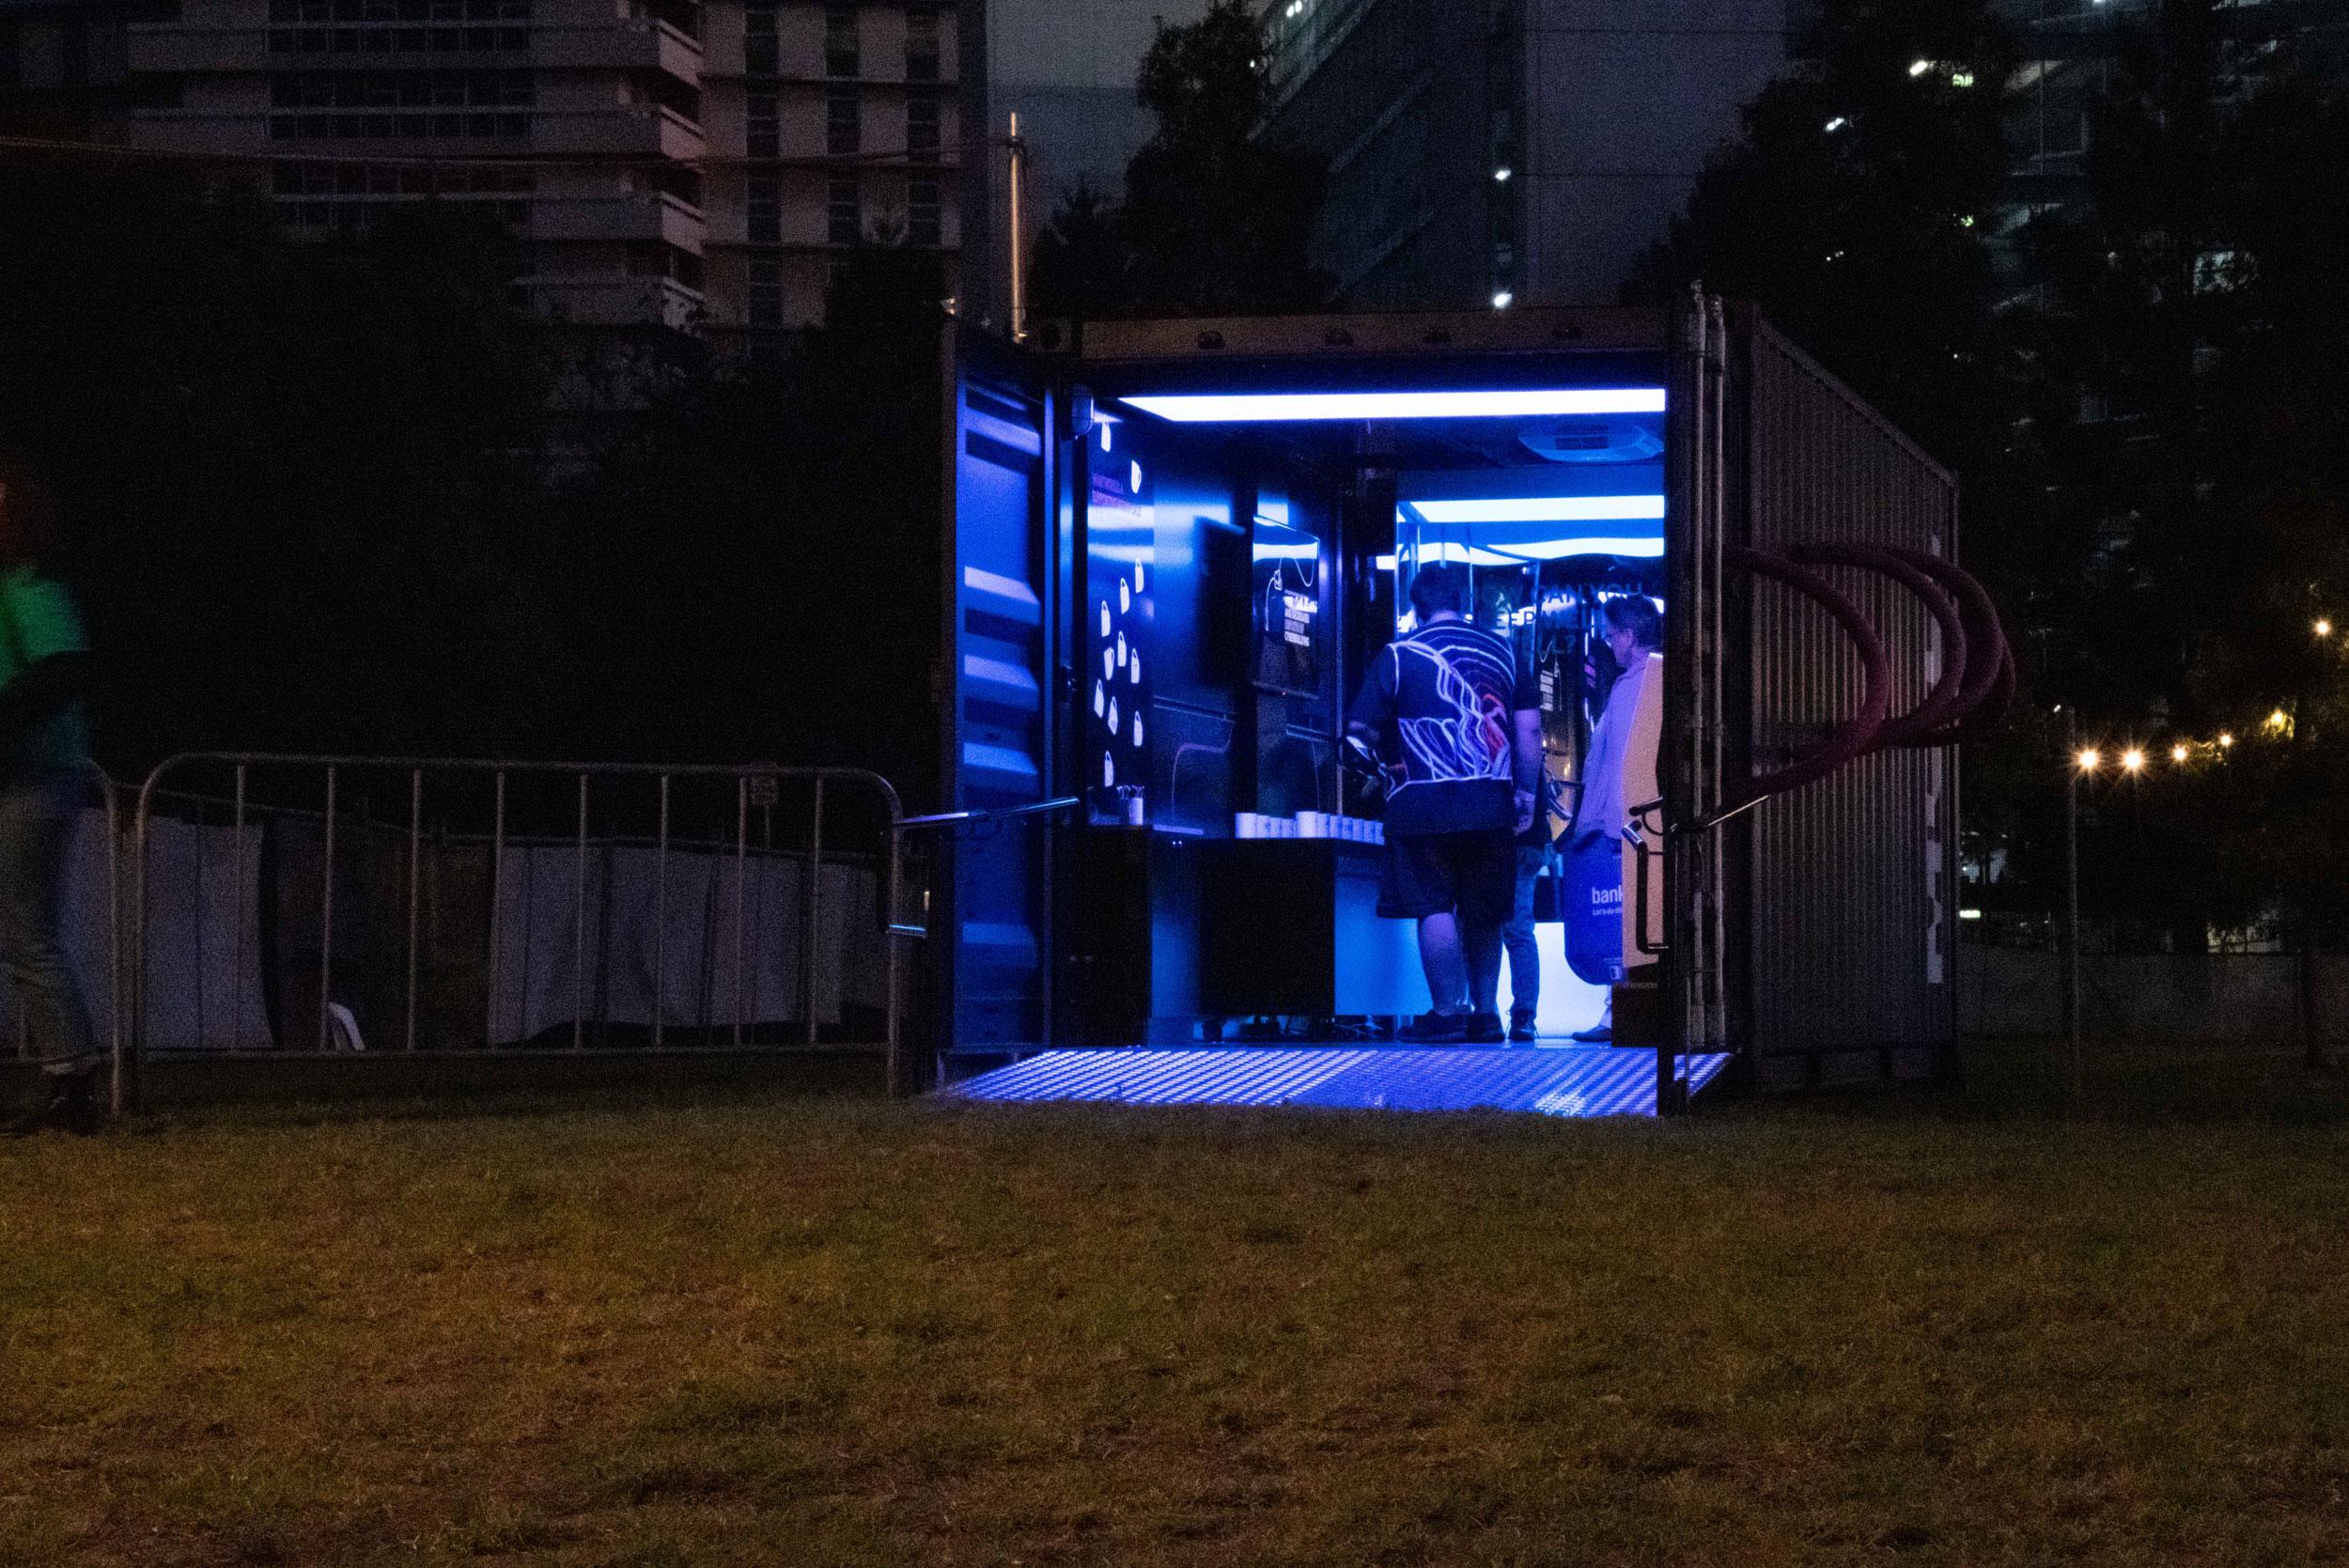 MOD. Sleep Ops Travelling Exhibition Image 3